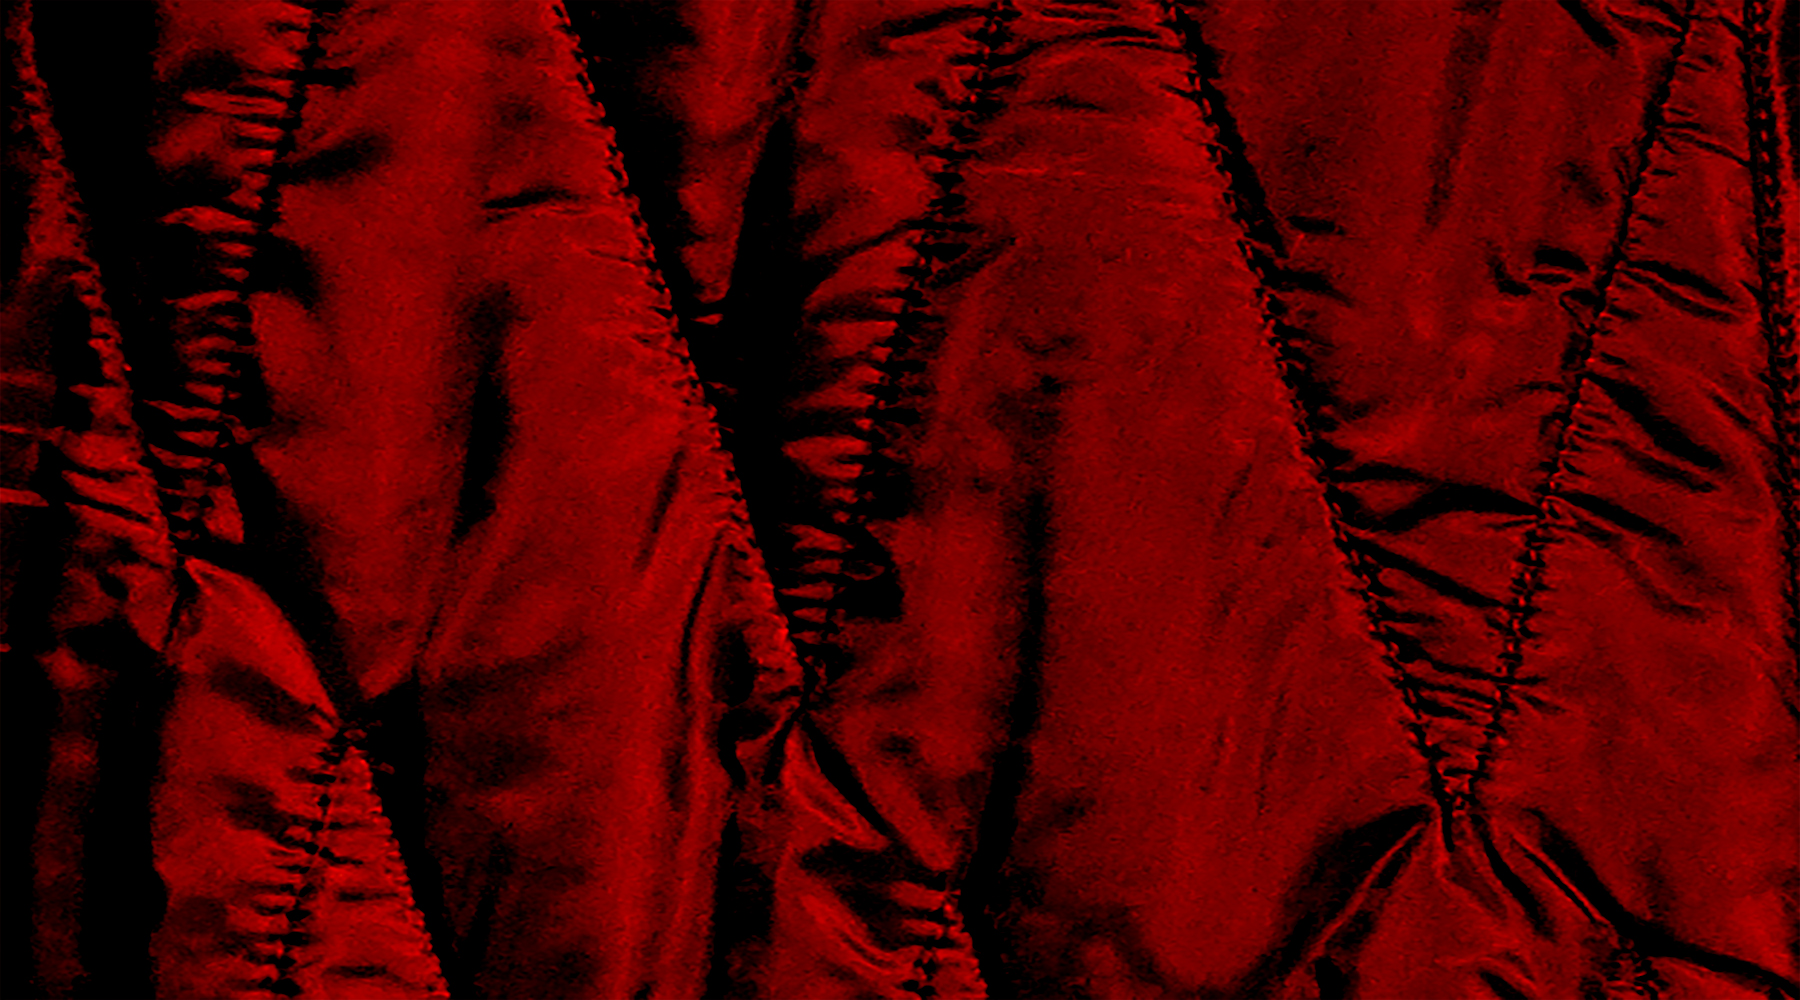 190117 rick owens fw19 larry s10 kit 019 fabric 2